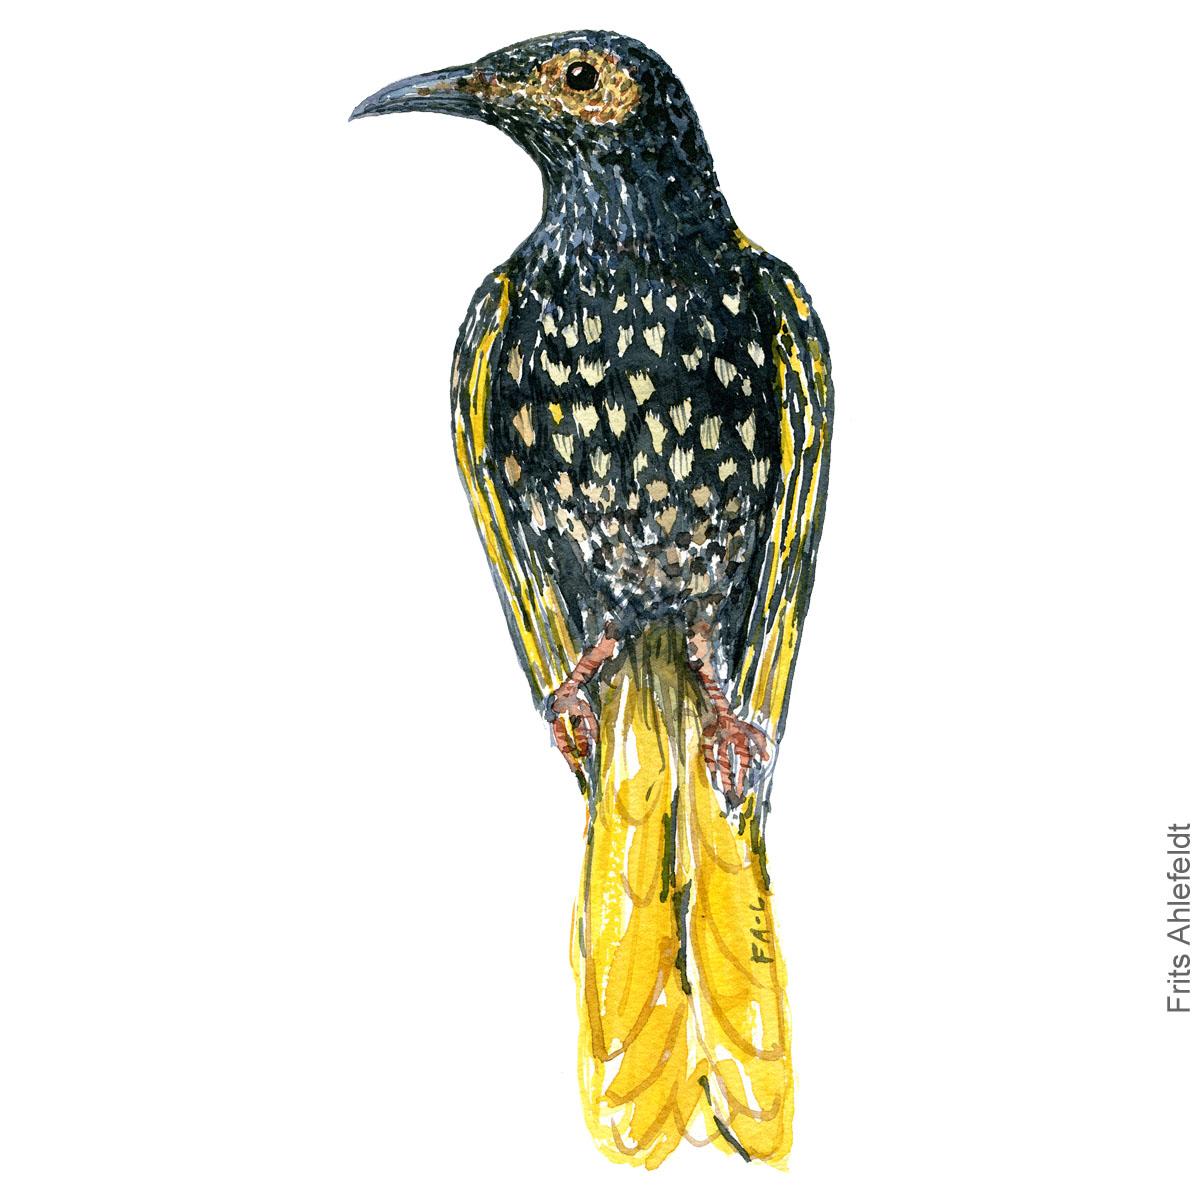 Regent honeyeater - Bird painting in watercolor by Frits Ahlefeldt - Fugle akvarel